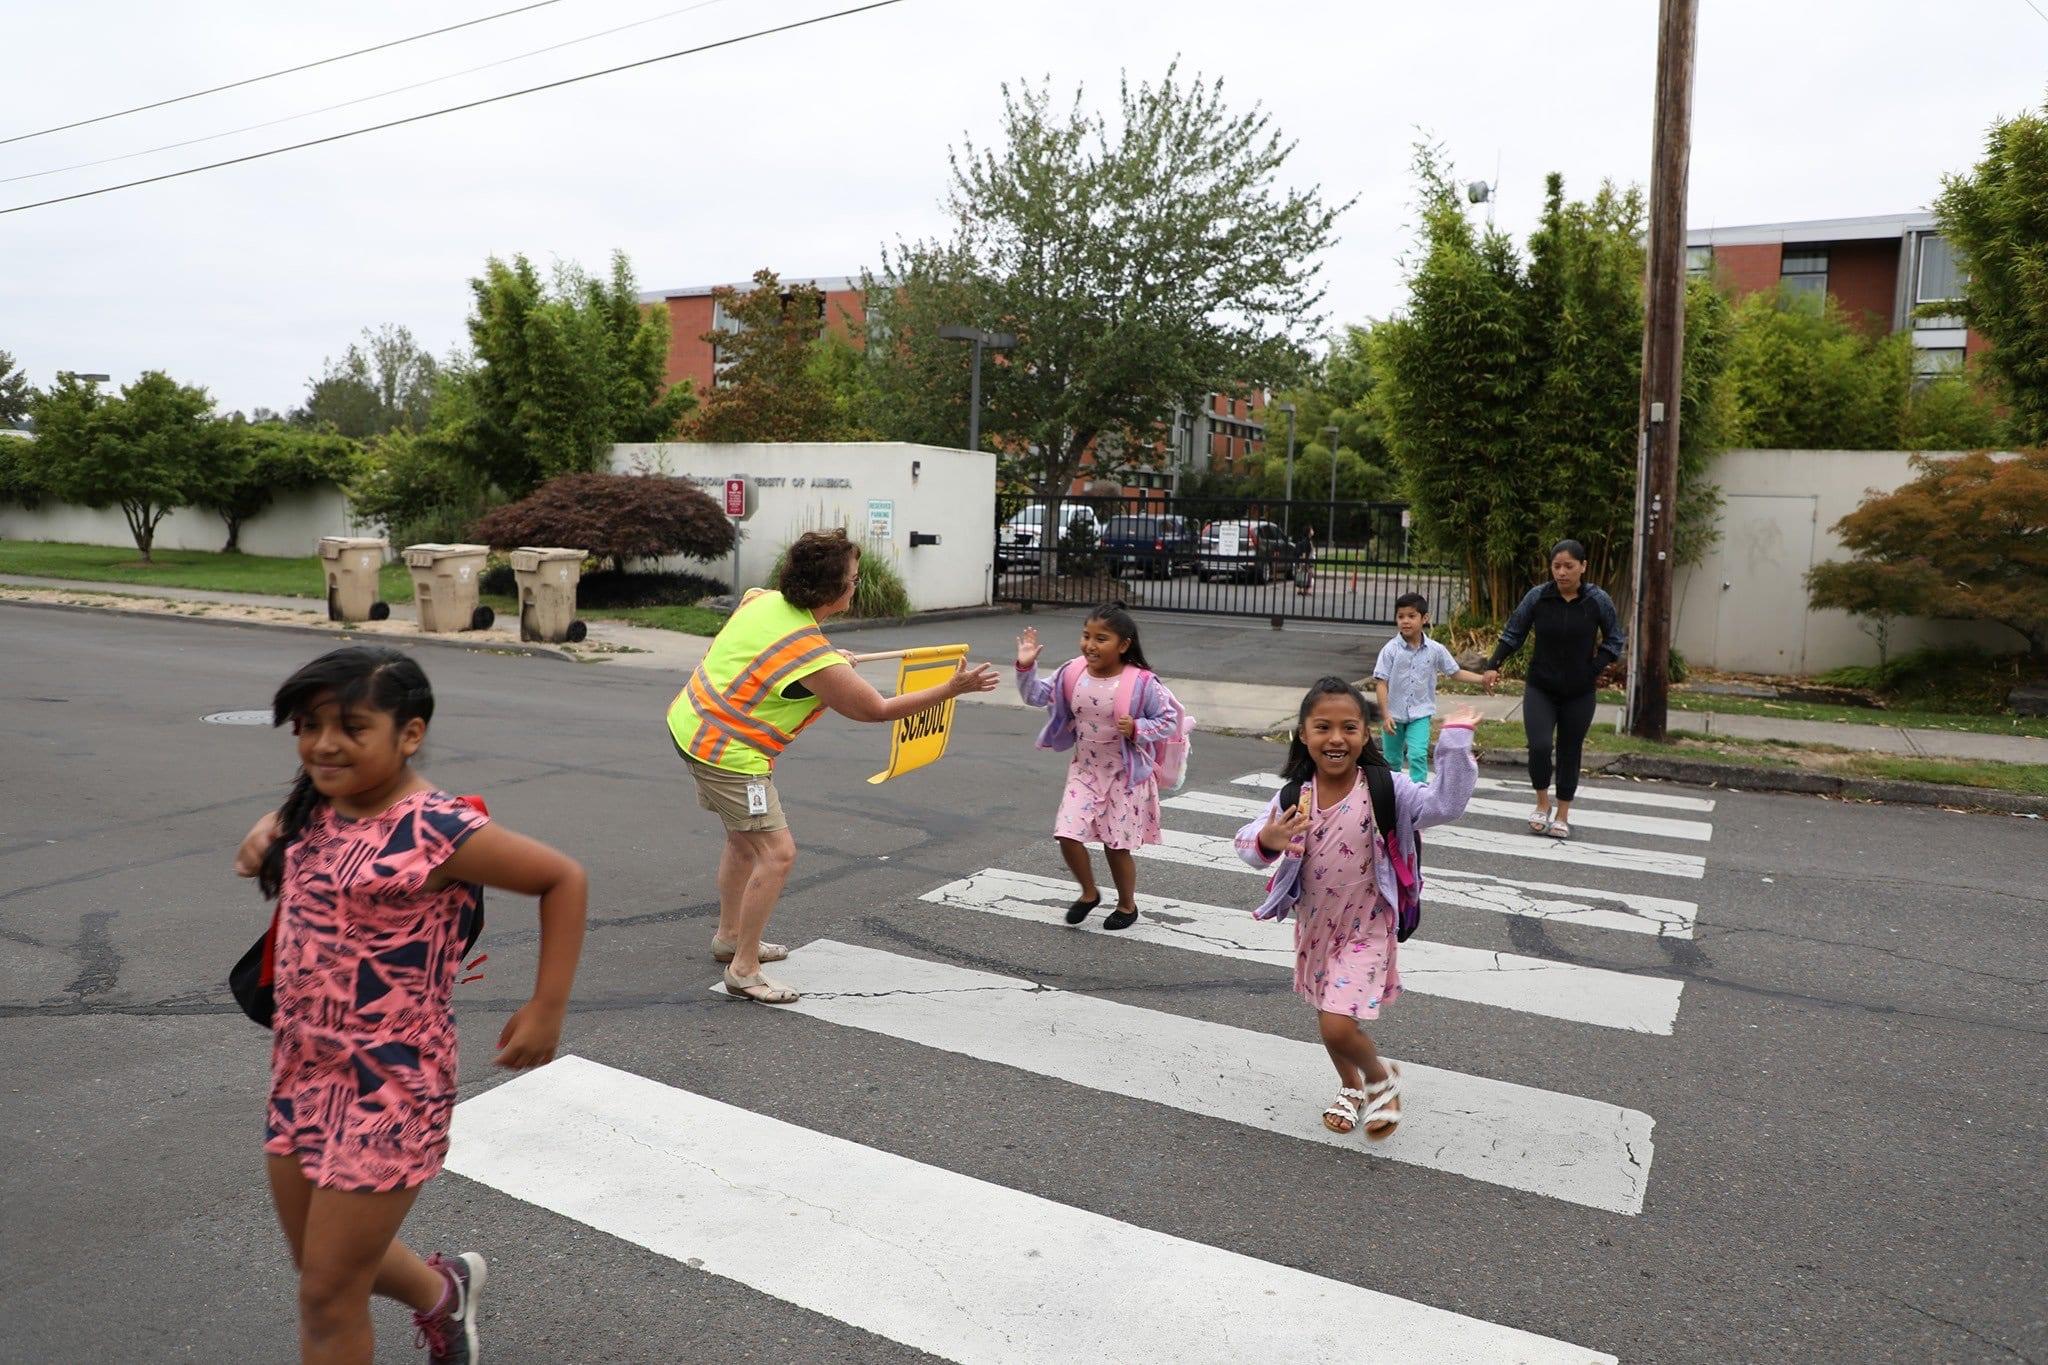 Students walking to school in crosswalk